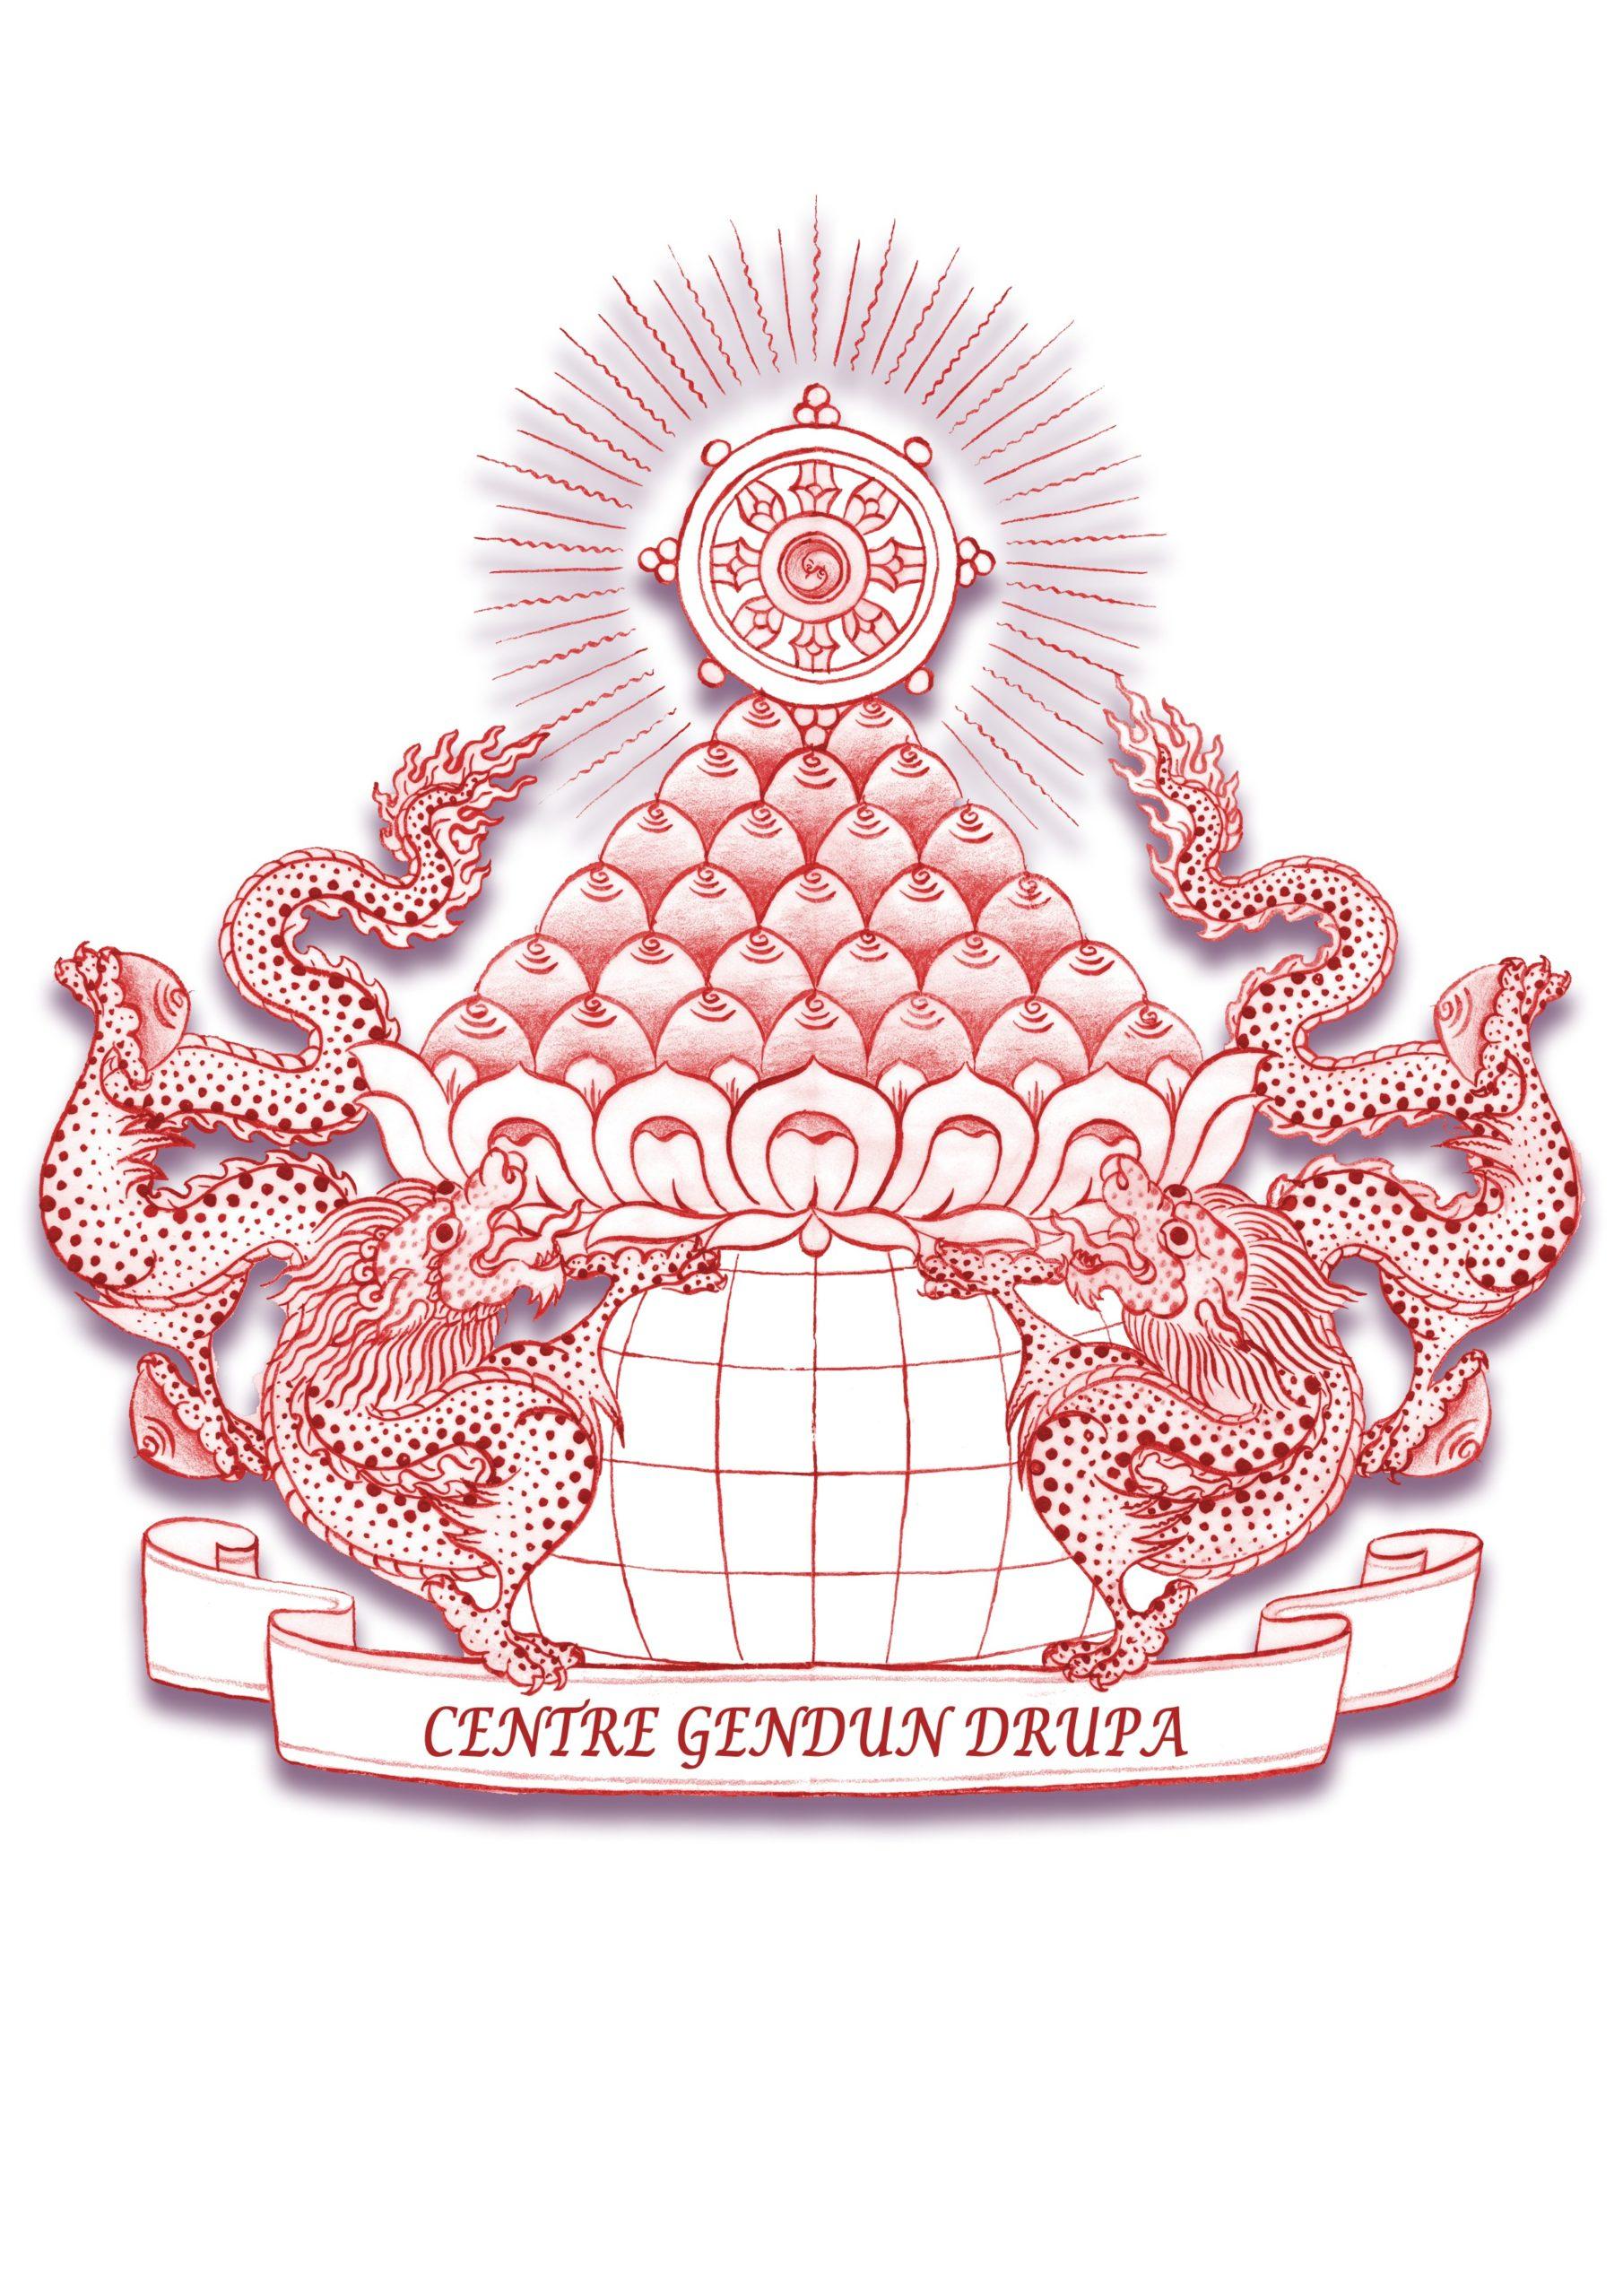 Centre Gendun Drupa